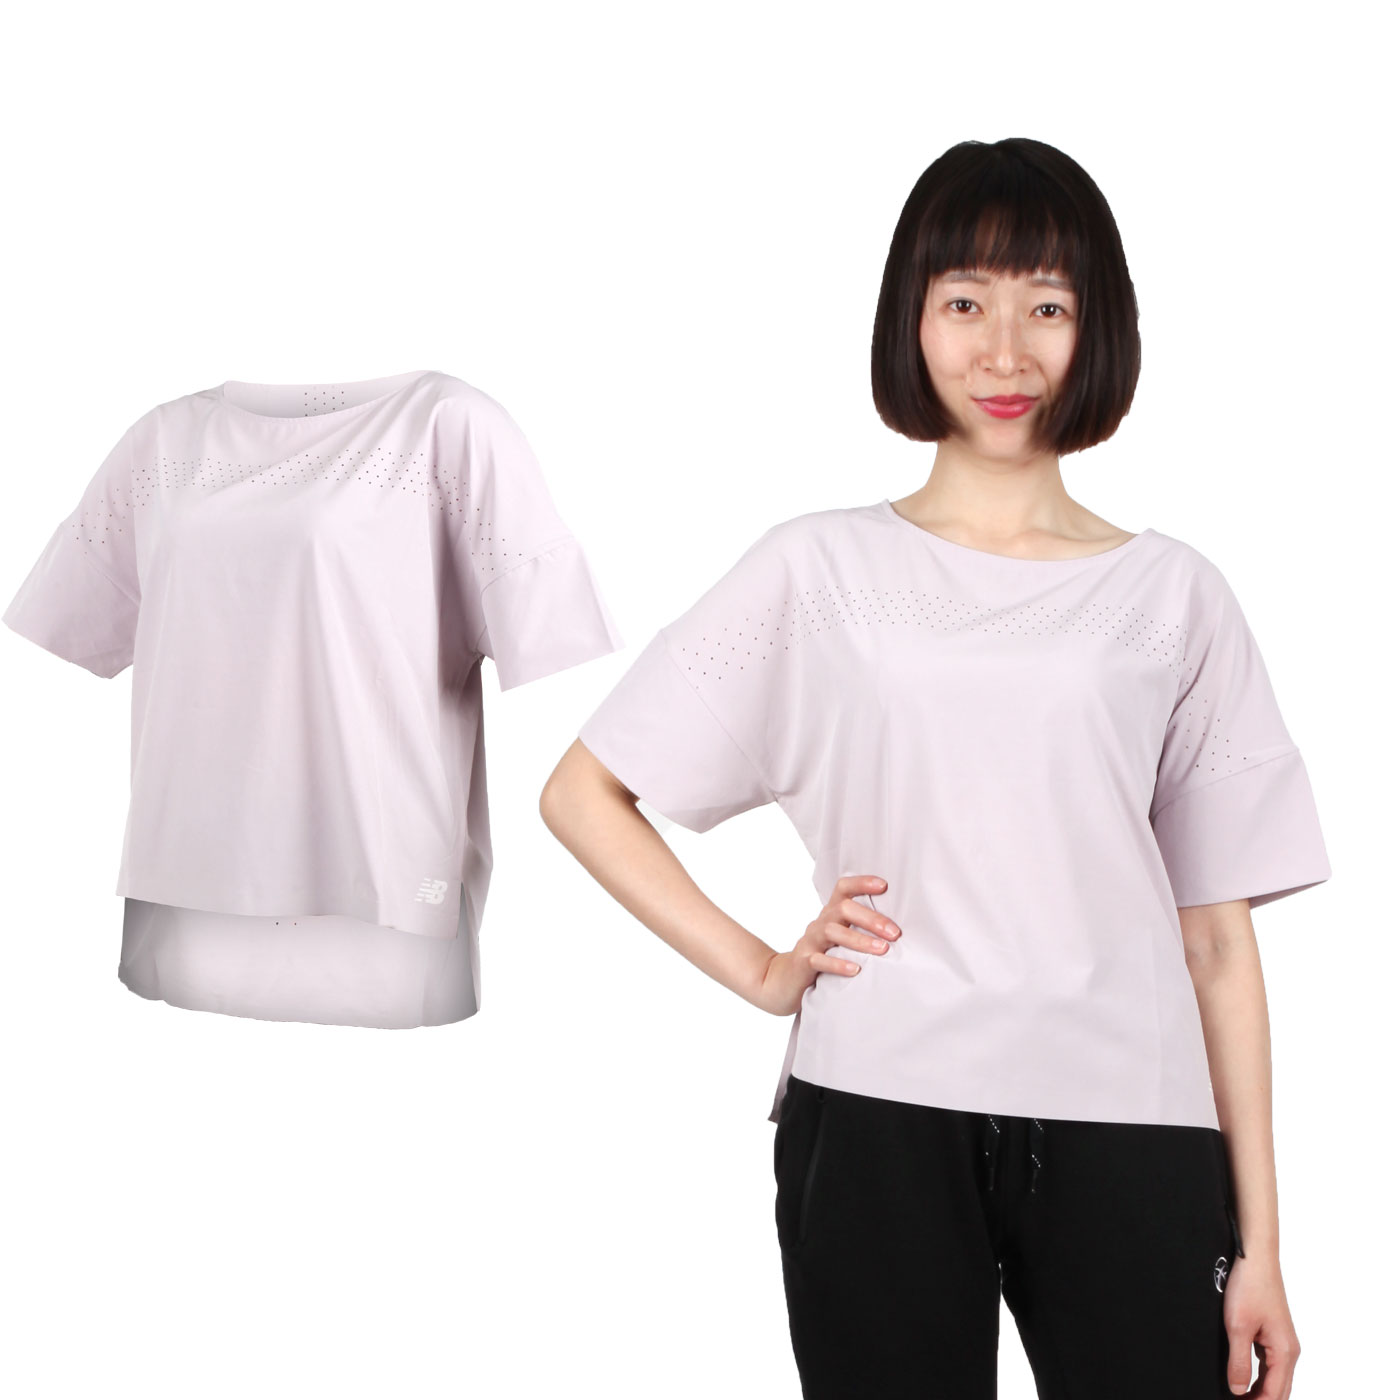 NEW BALANCE 女款短袖T恤 WT91503LCS - 淺紫